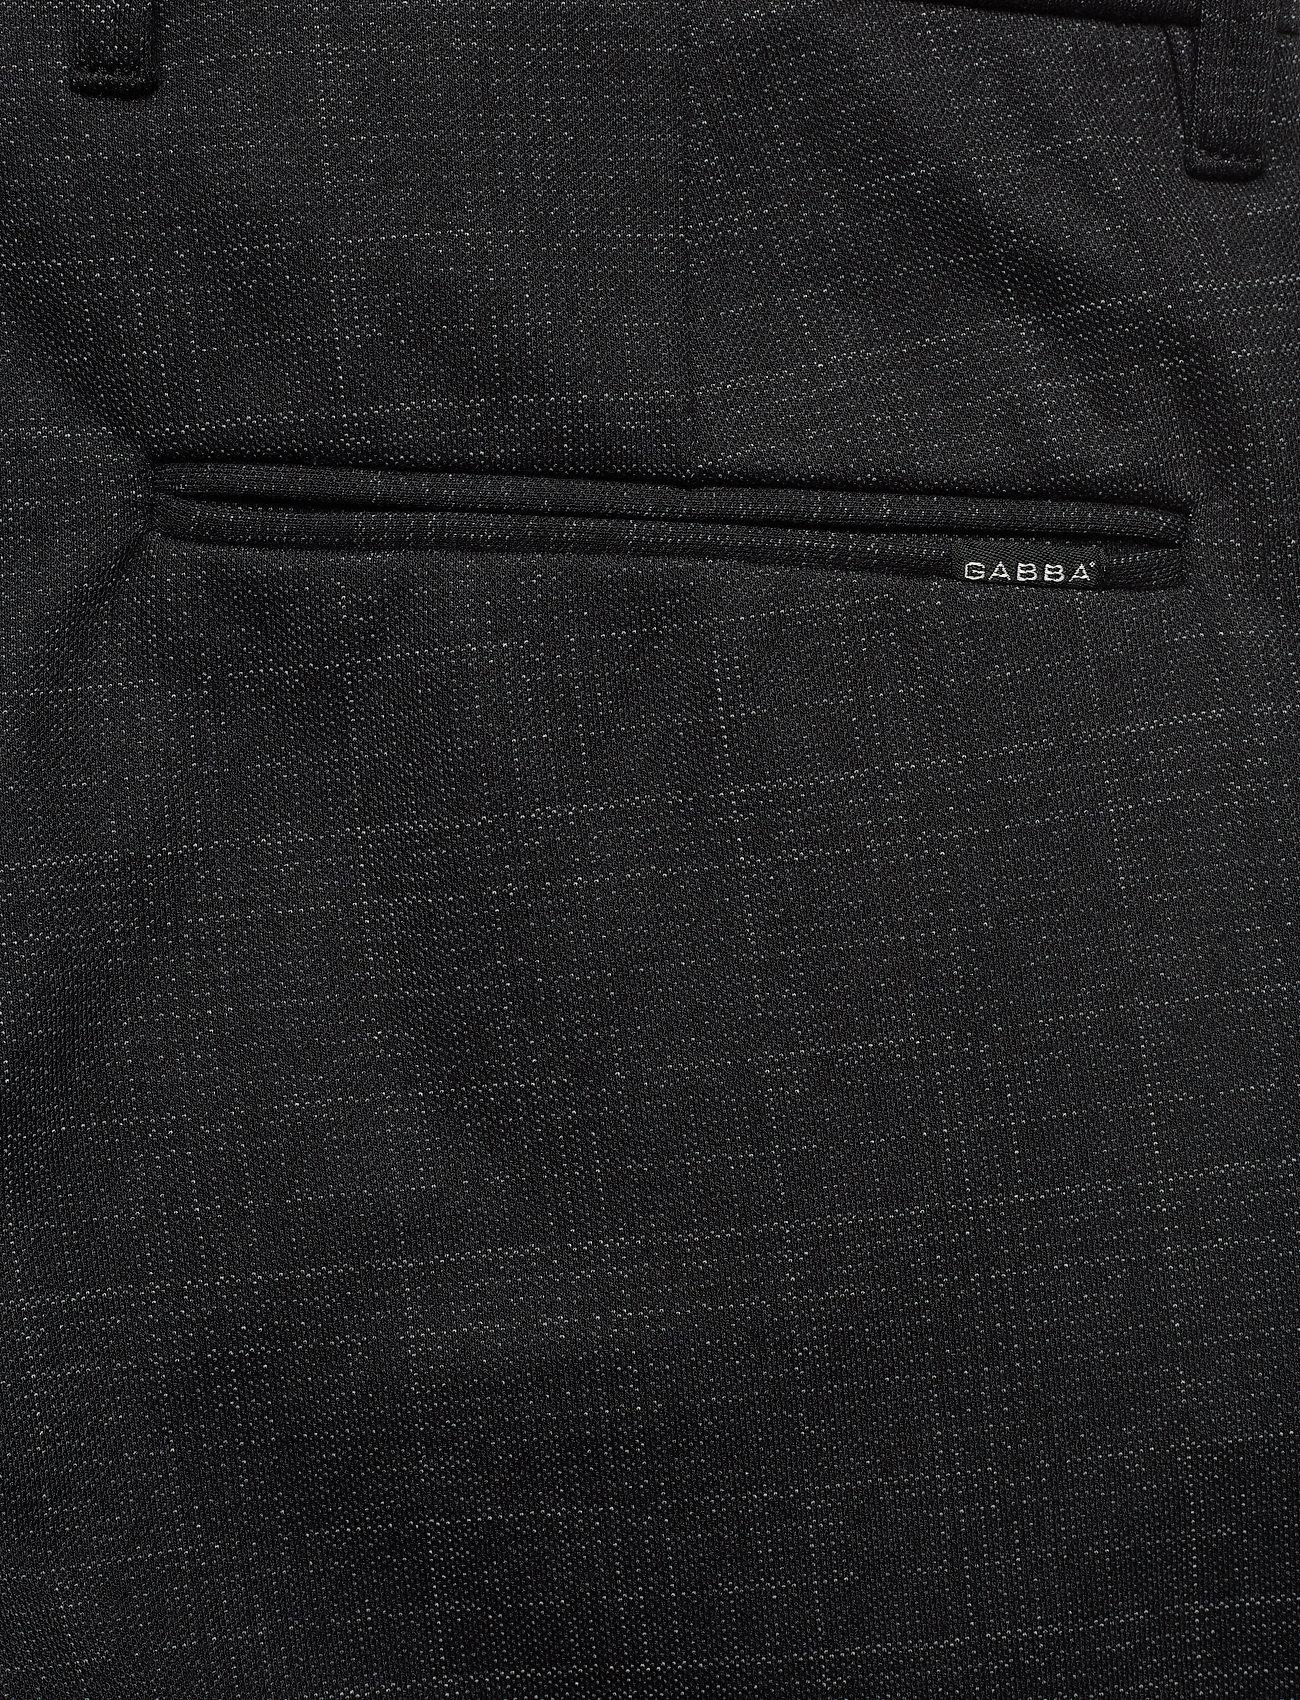 Gabba Pisa KD3920 Black Shadow Check Pant - Bukser BLACK CHECK - Menn Klær